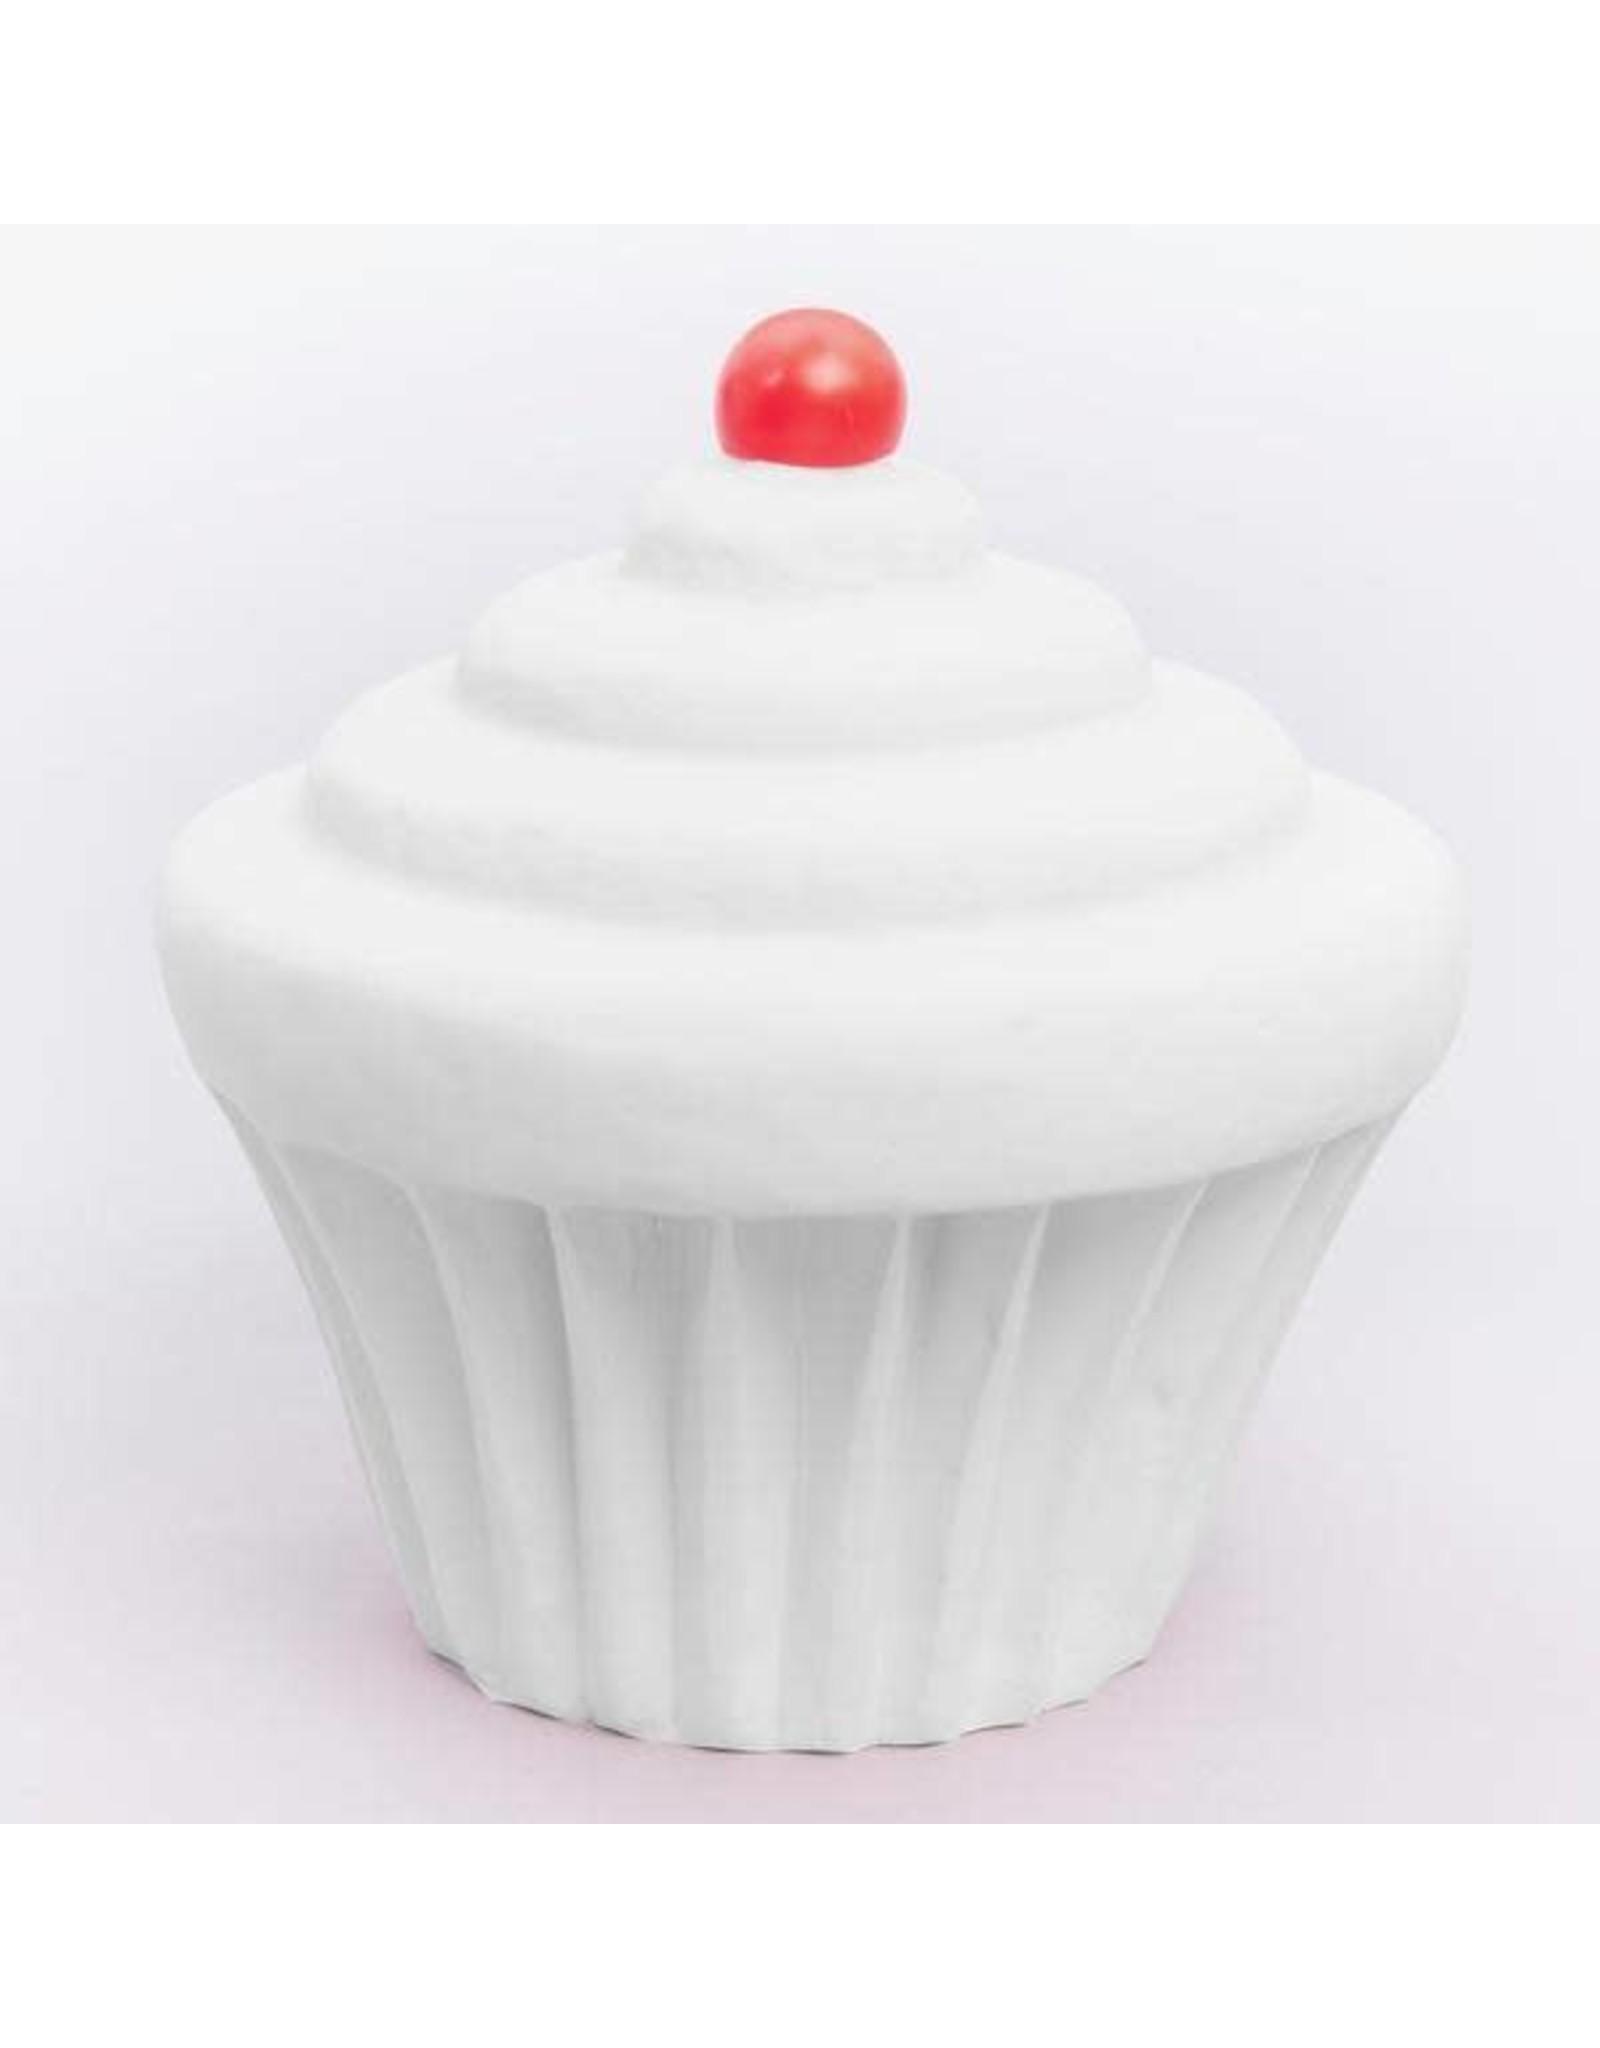 littlelampcompany Littlelampcompany Cupcake Vanilla